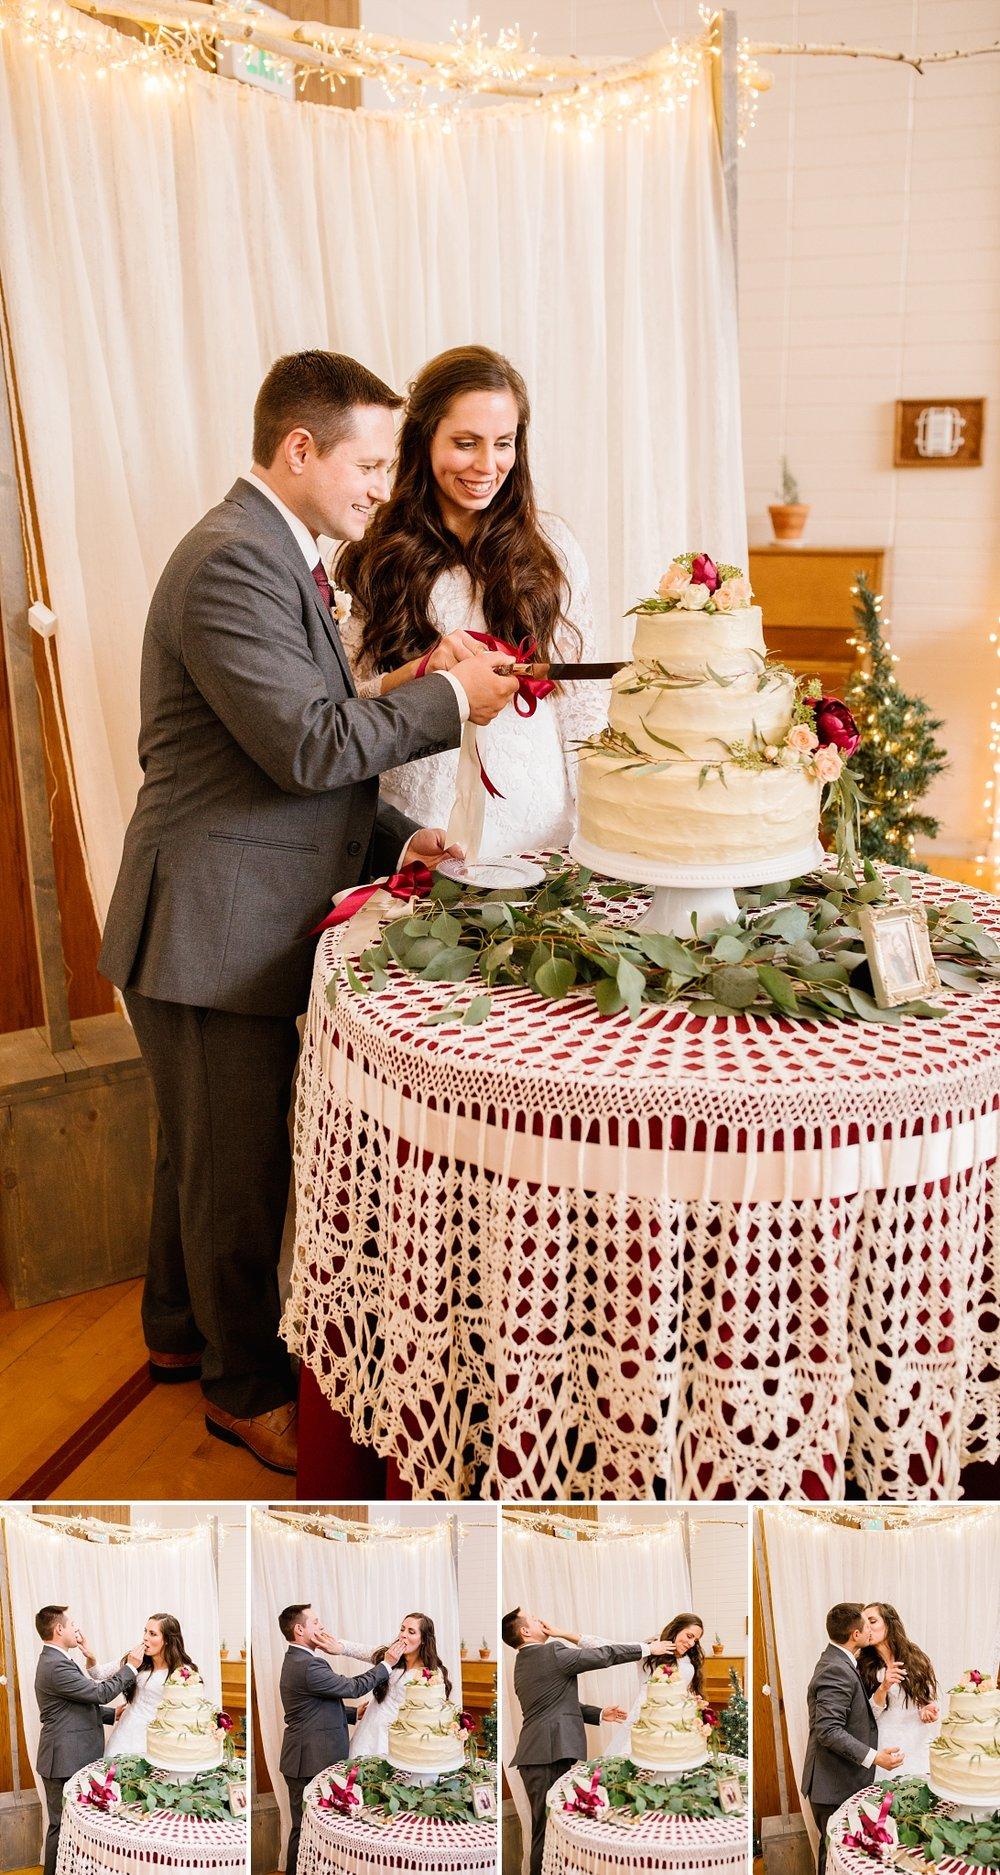 SS-Wedding-472_Lizzie-B-Imagery-Utah-Wedding-Photographer-Logan-Temple-Logan-Canyon-Mountain-Horse-Session.jpg